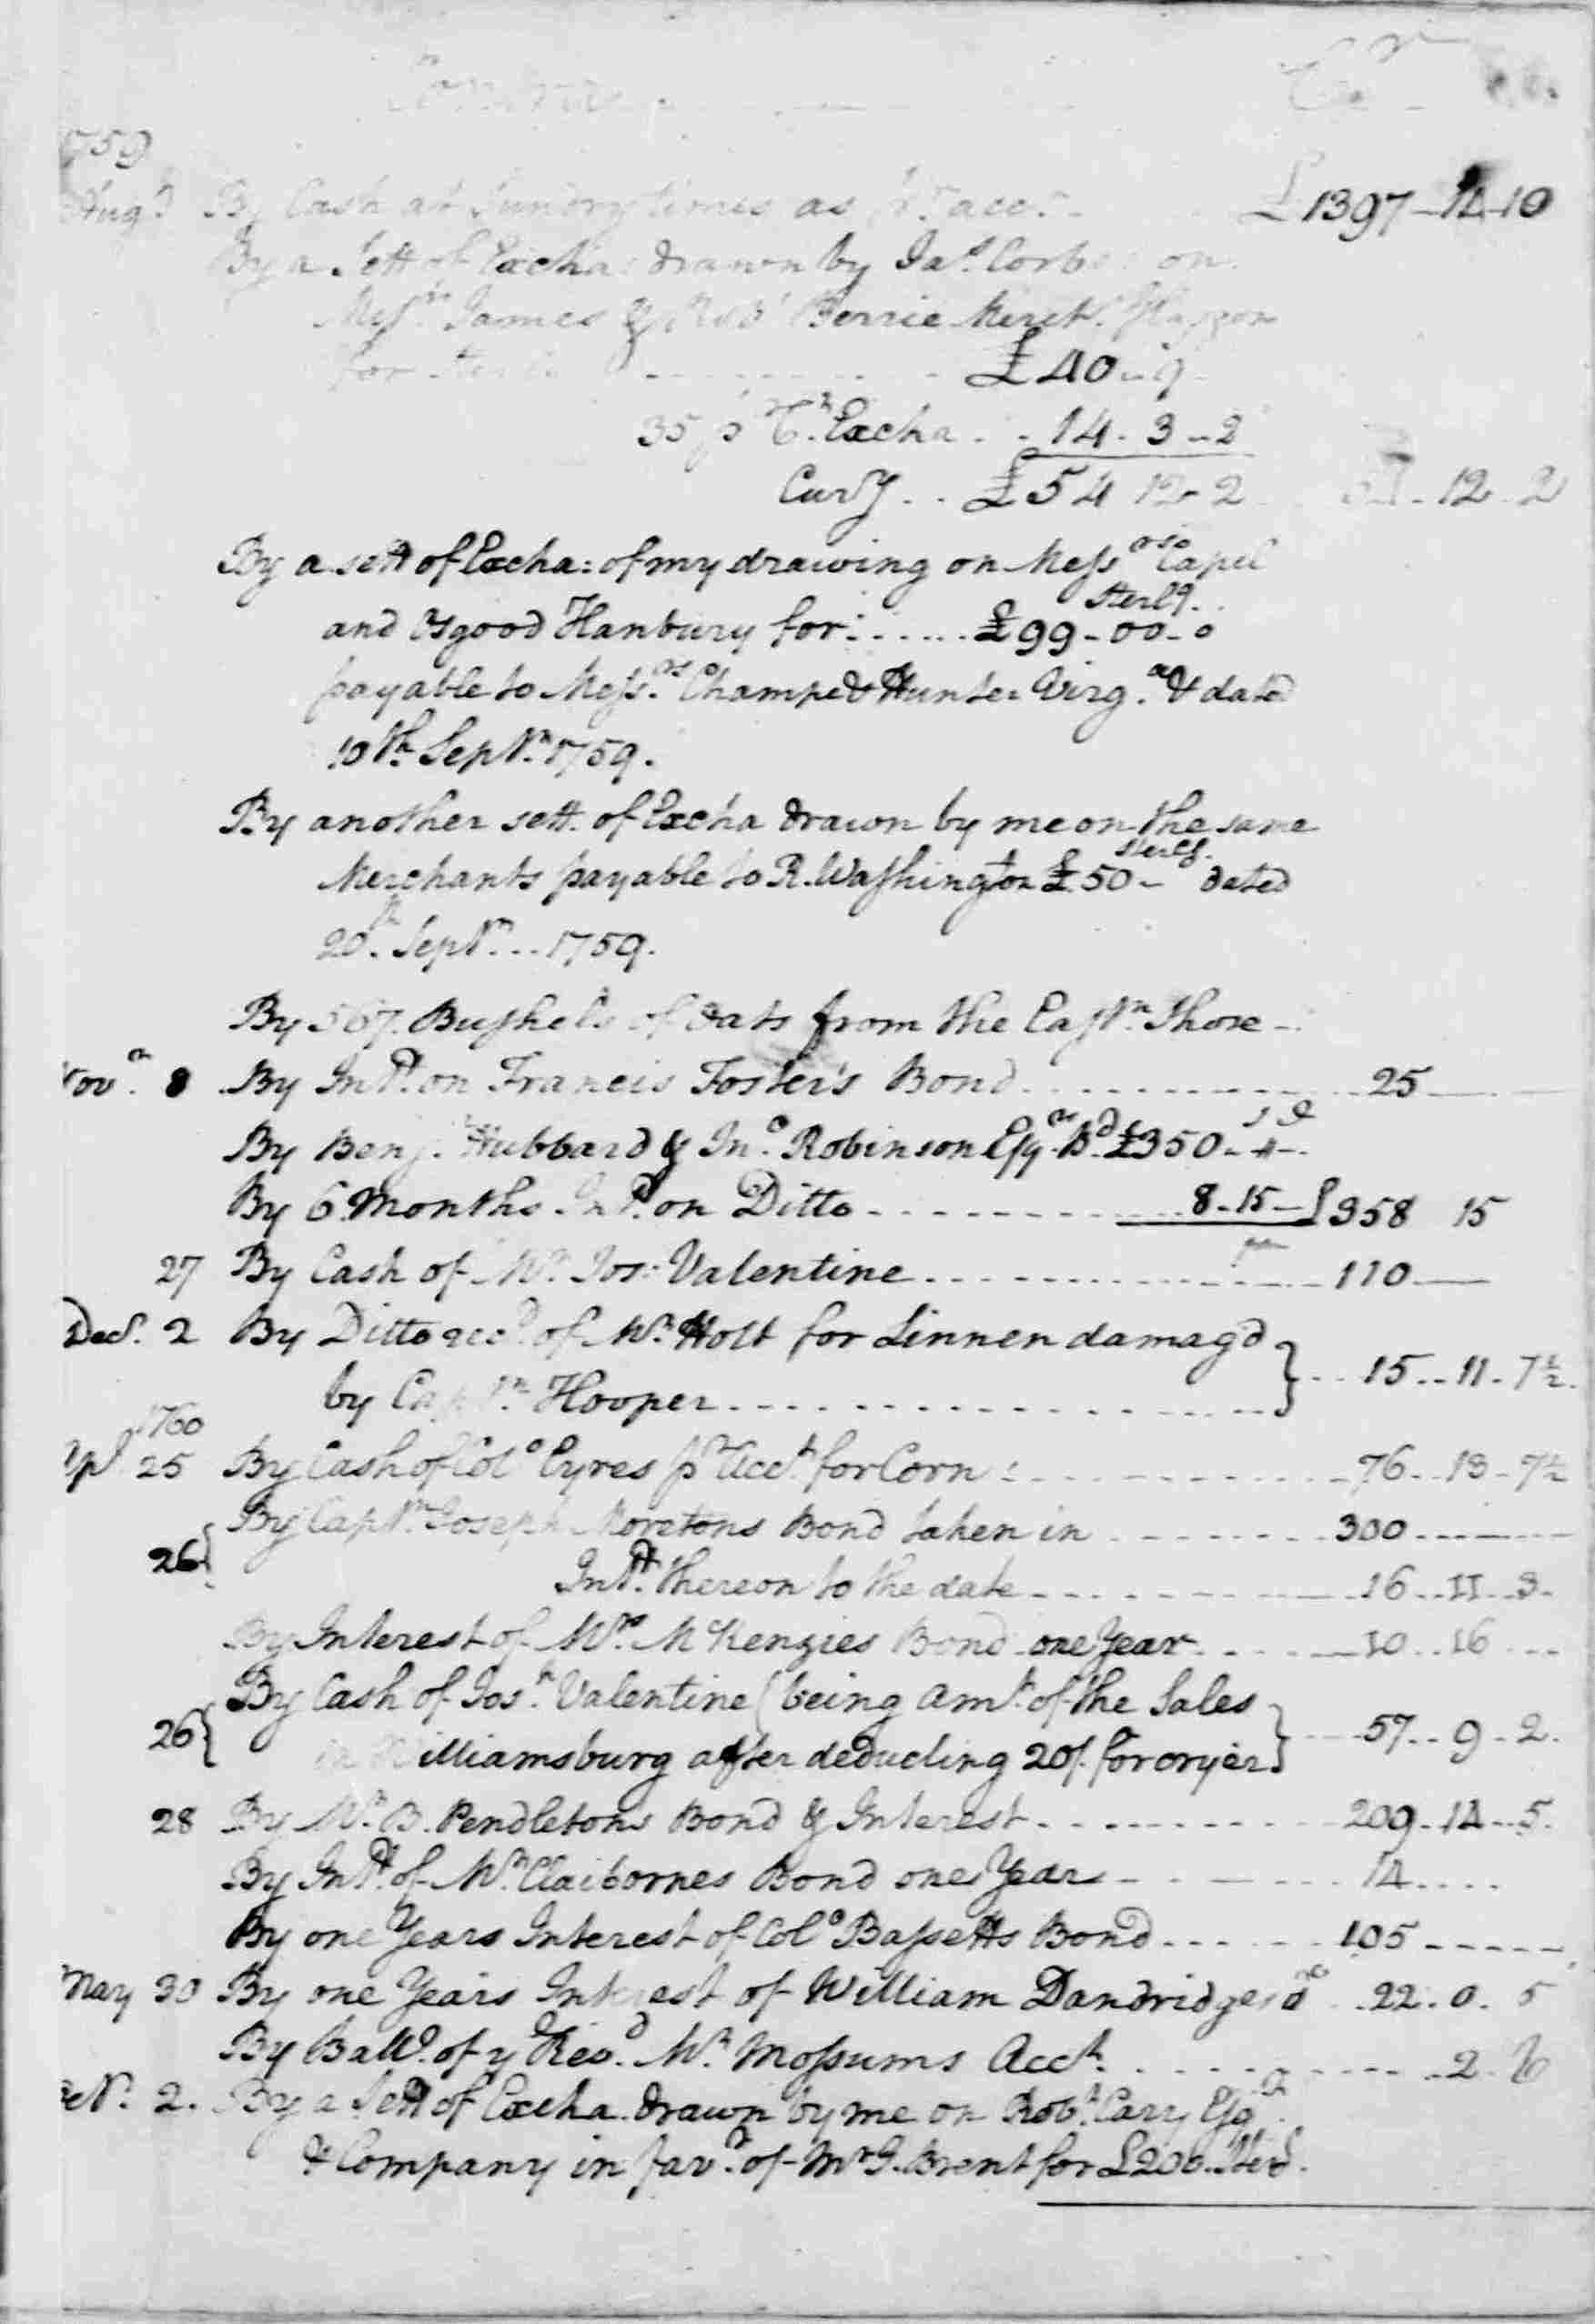 Ledger A, folio 57, right side